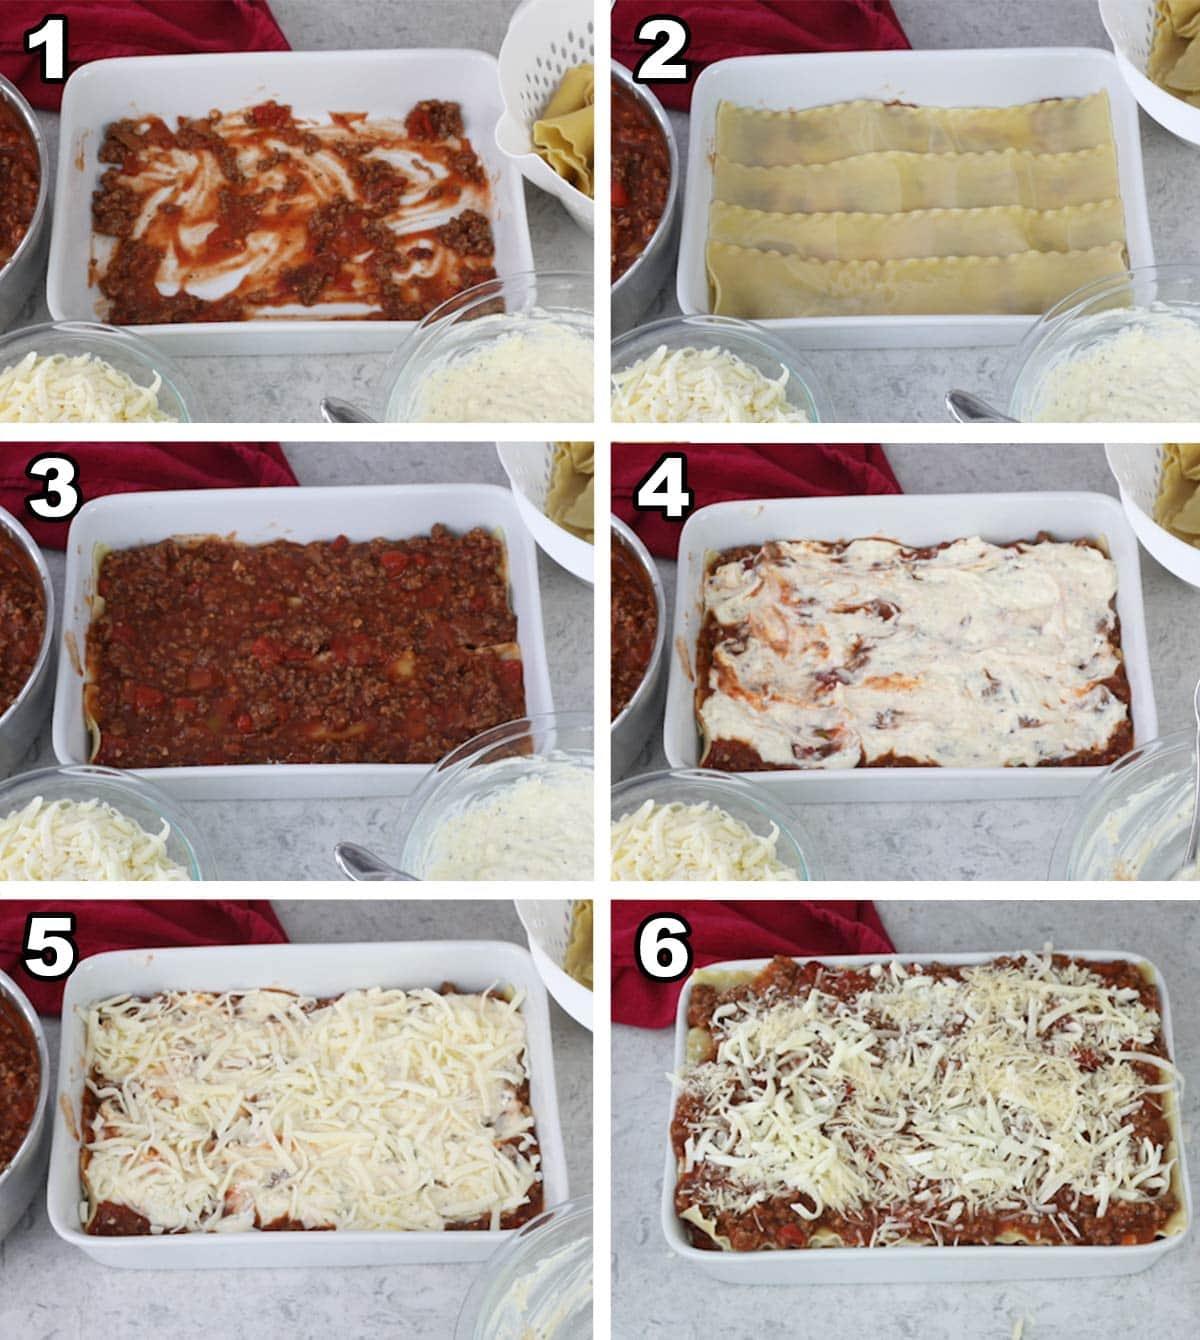 Lasagna assembly steps